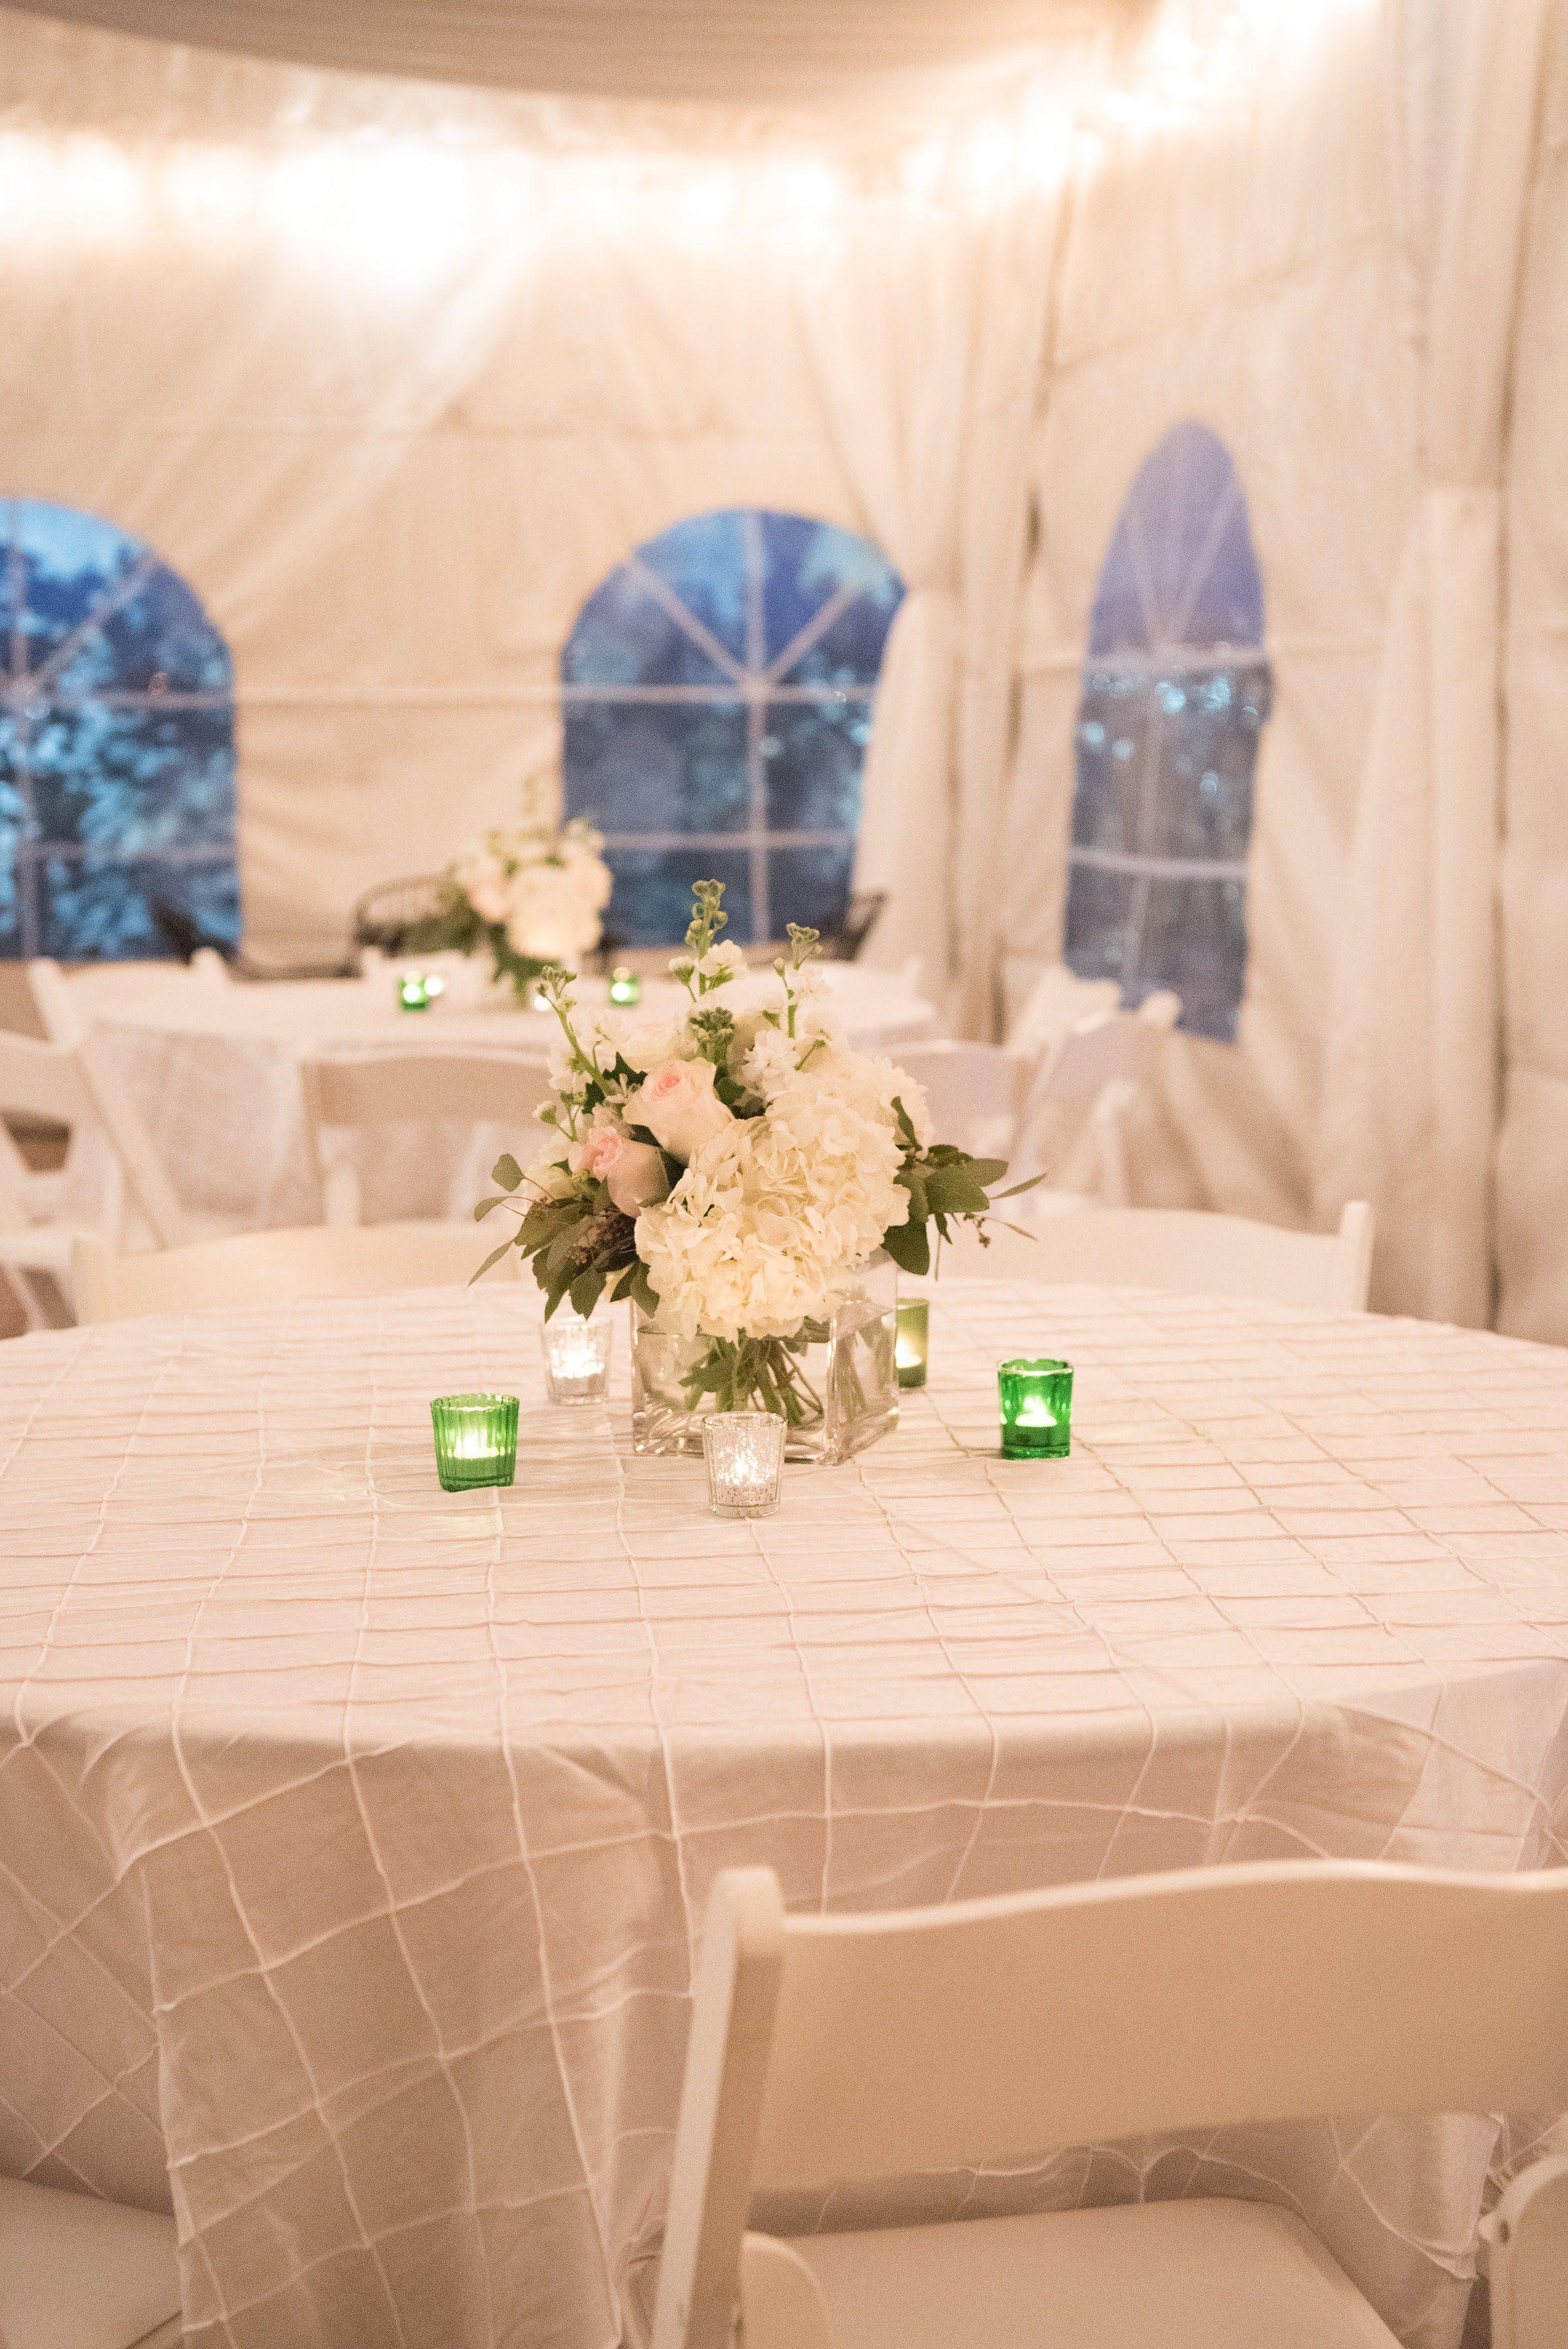 Savannahwedding Southernwedding Weddingceremony